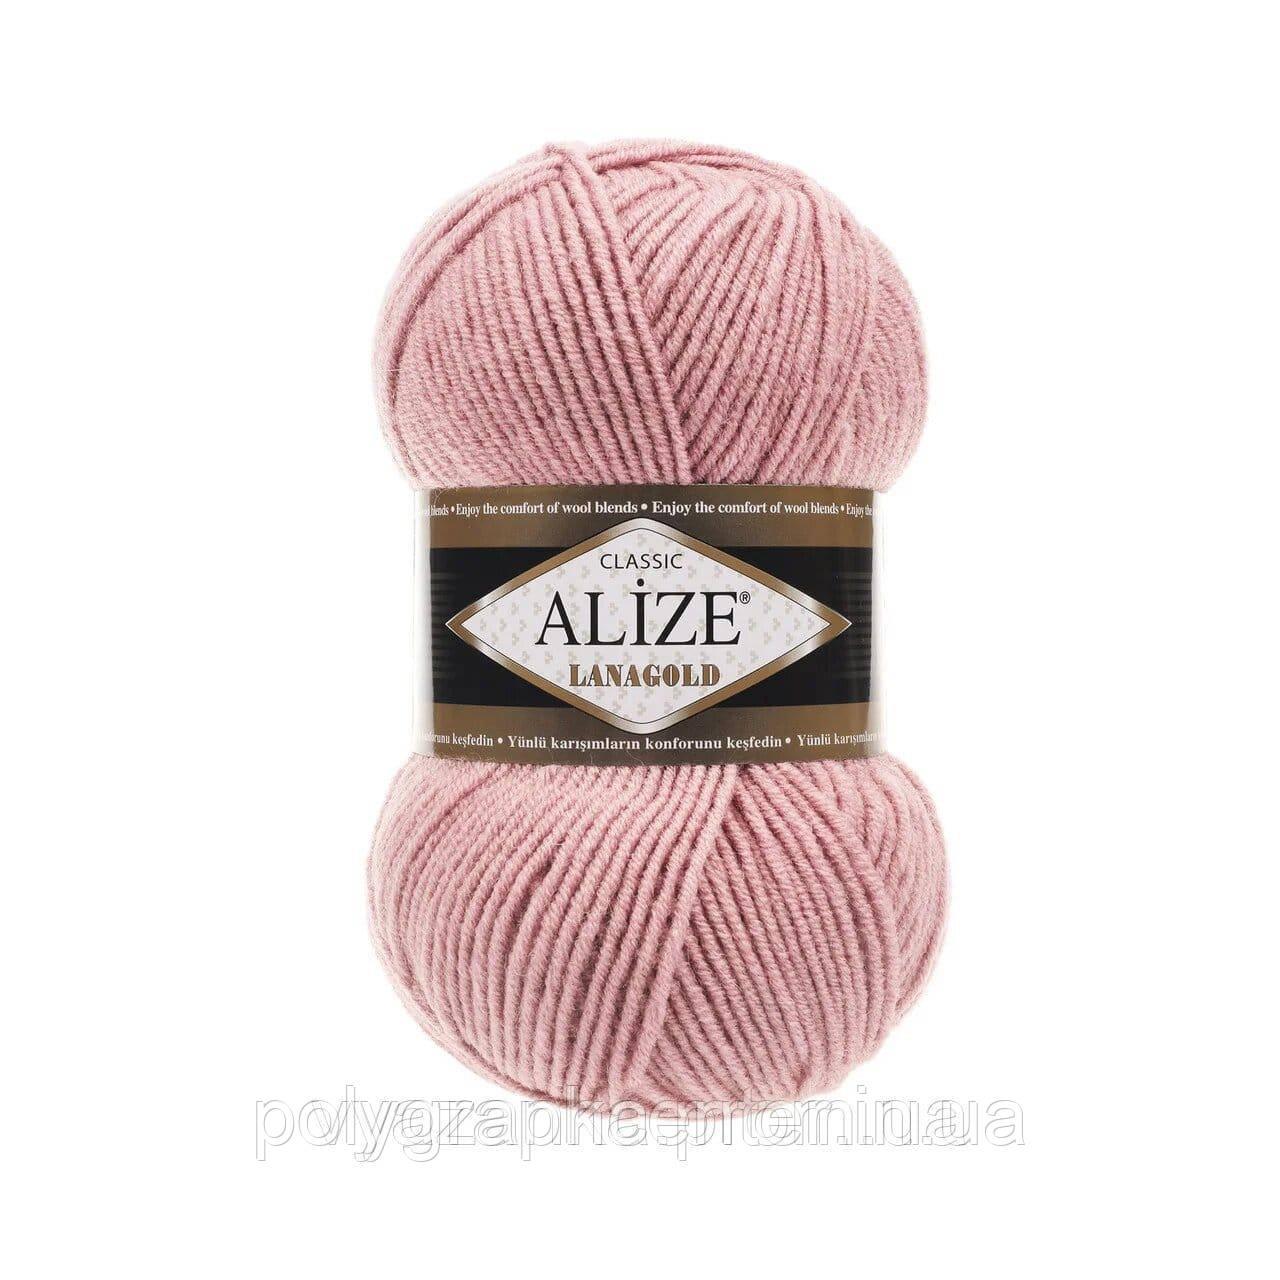 Пряжа Alize Лана голд Lanagold,№161, пудра